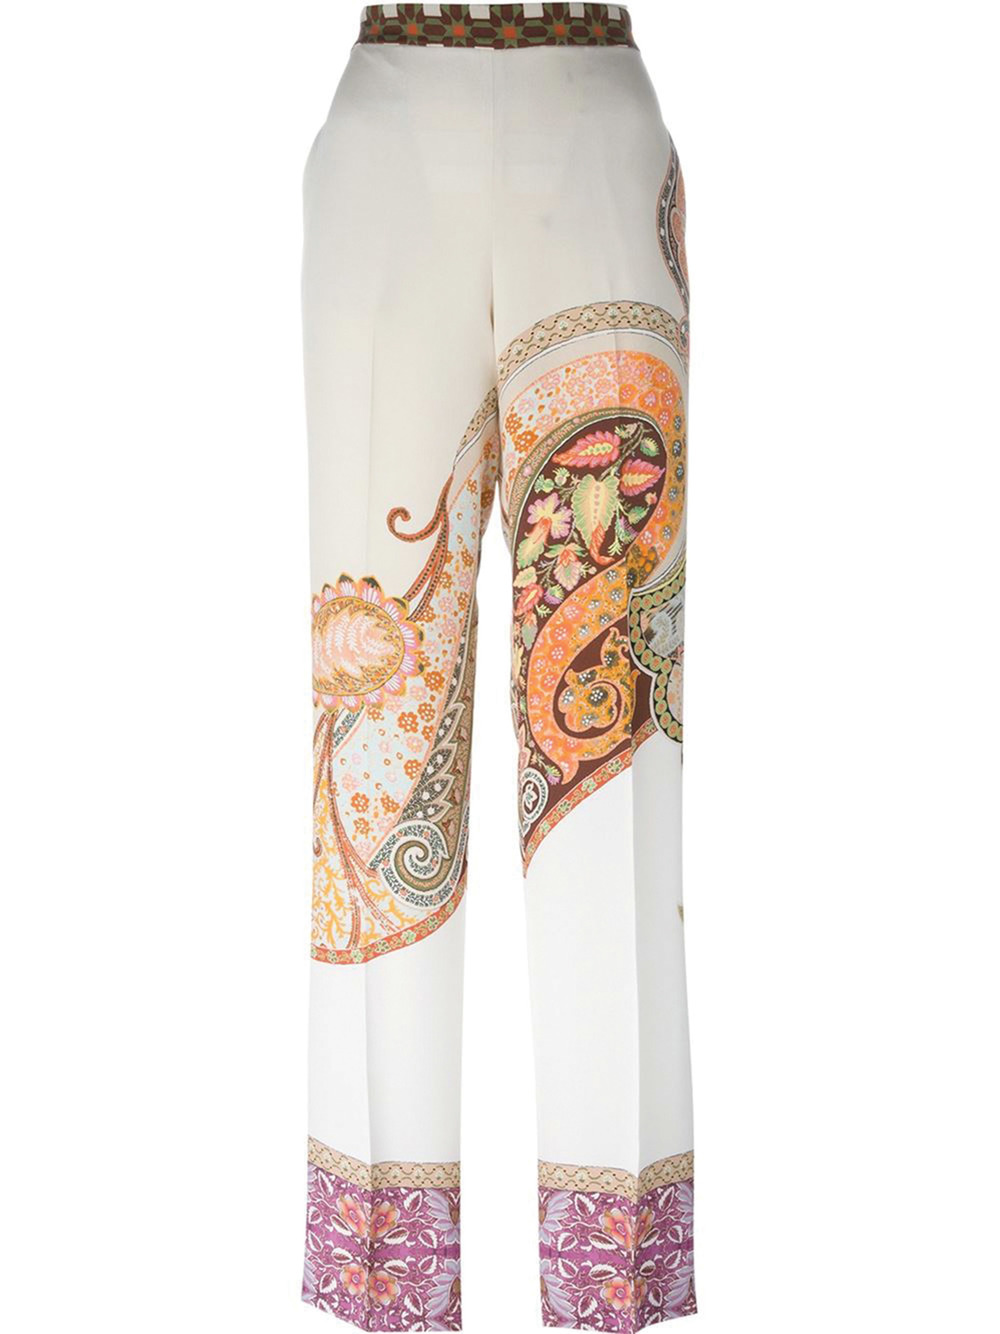 Etro Paisley Print Wide-Leg Trousers $1,147